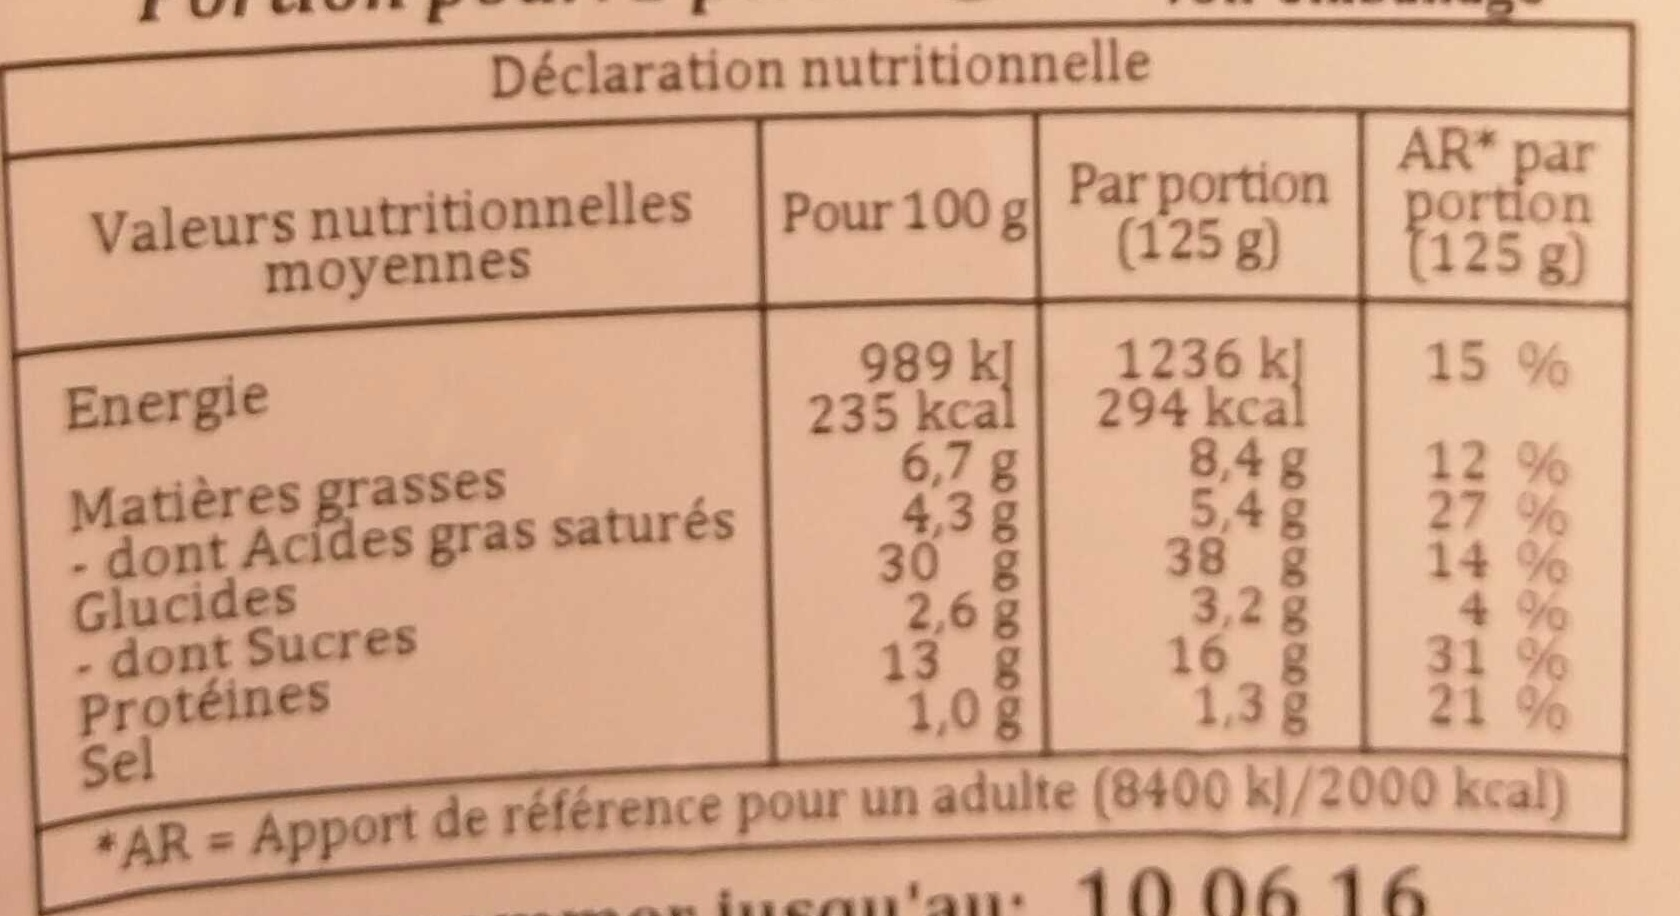 Tournesols Mozzarella Tomate - Voedingswaarden - fr